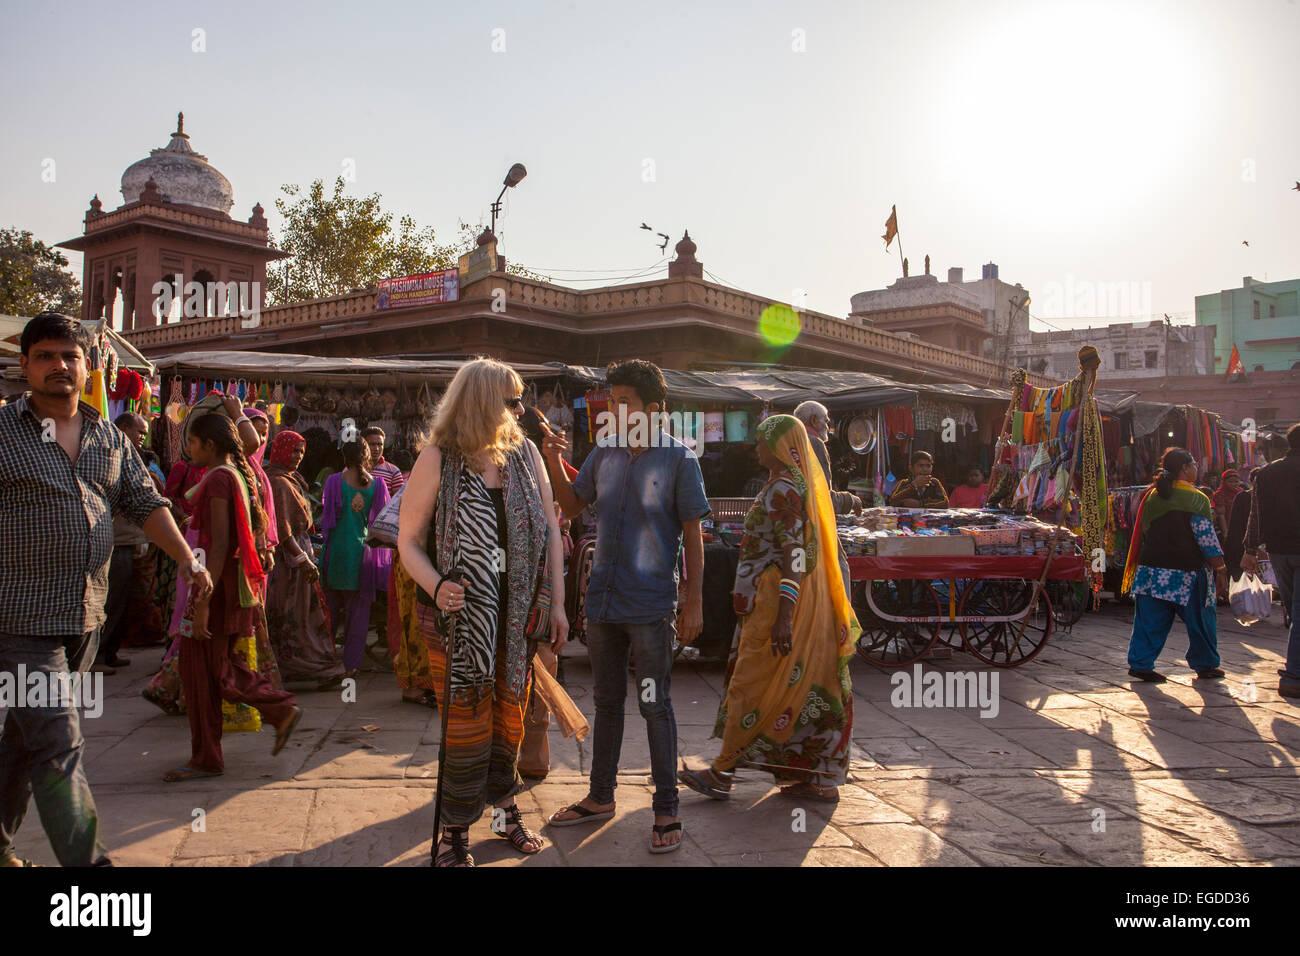 Indian market scene Jodhpur - Stock Image